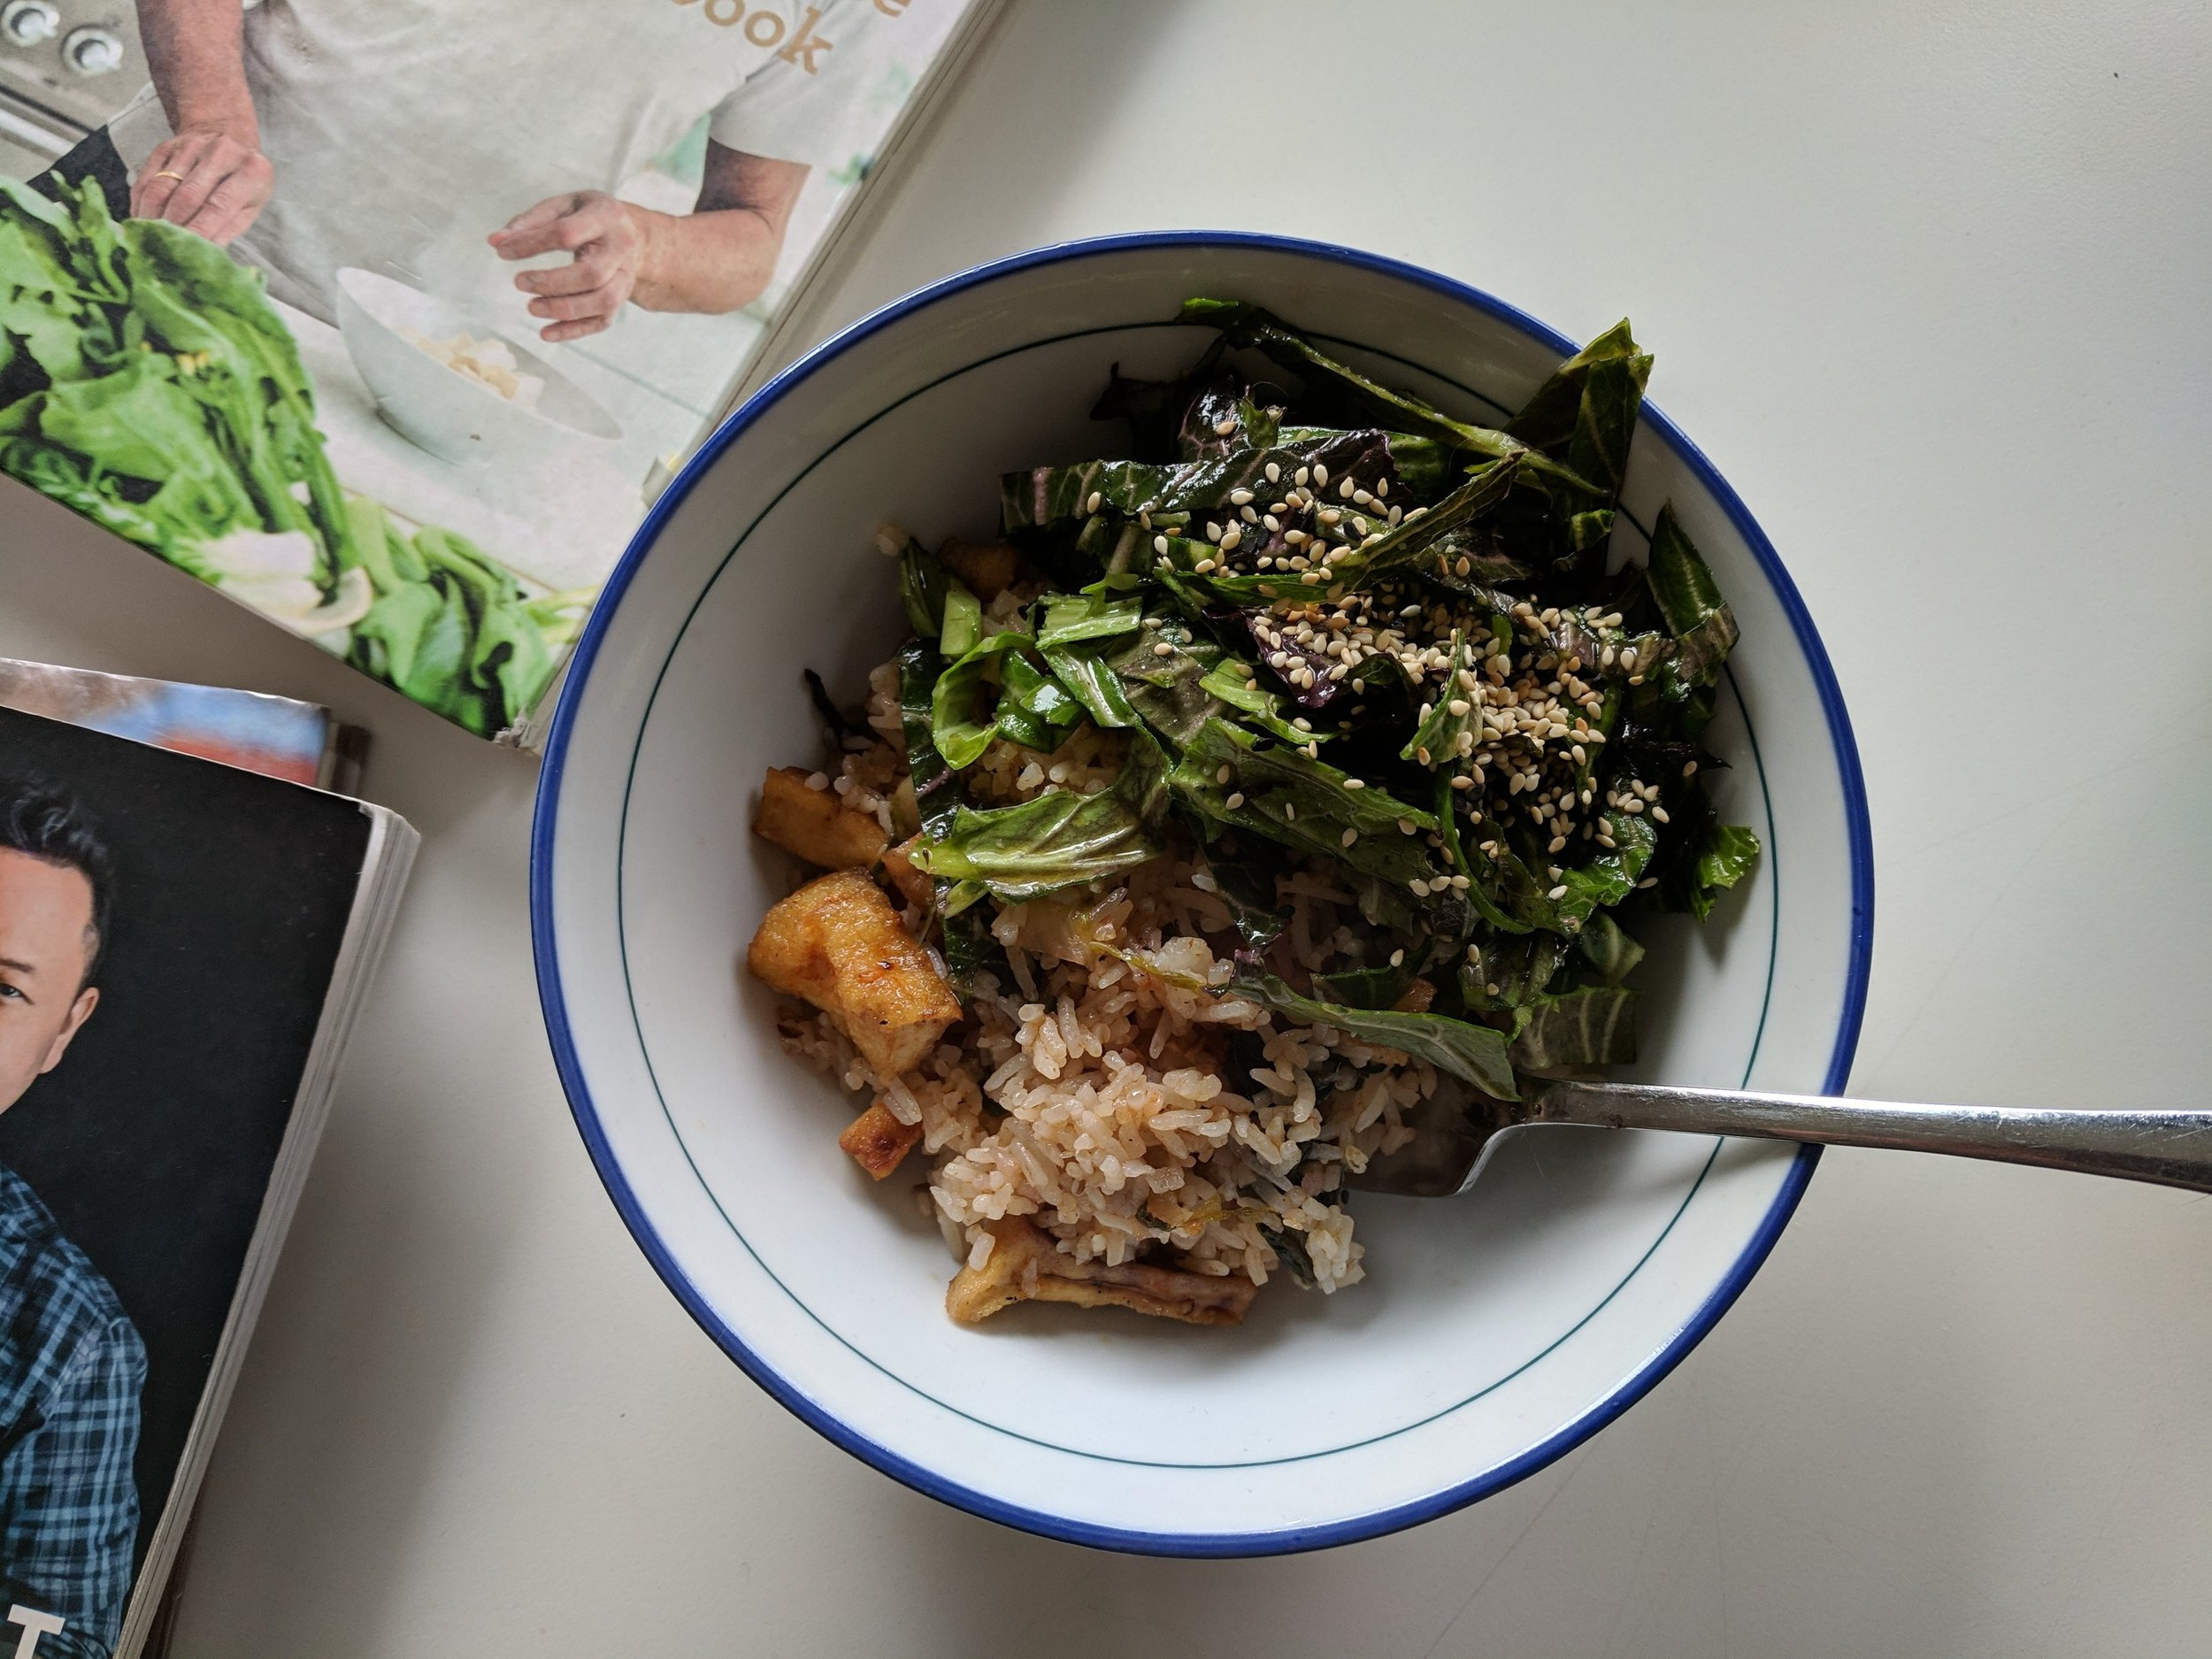 sichuan salt & pepper fried tofu, citrus miso slaw, long grain brown rice